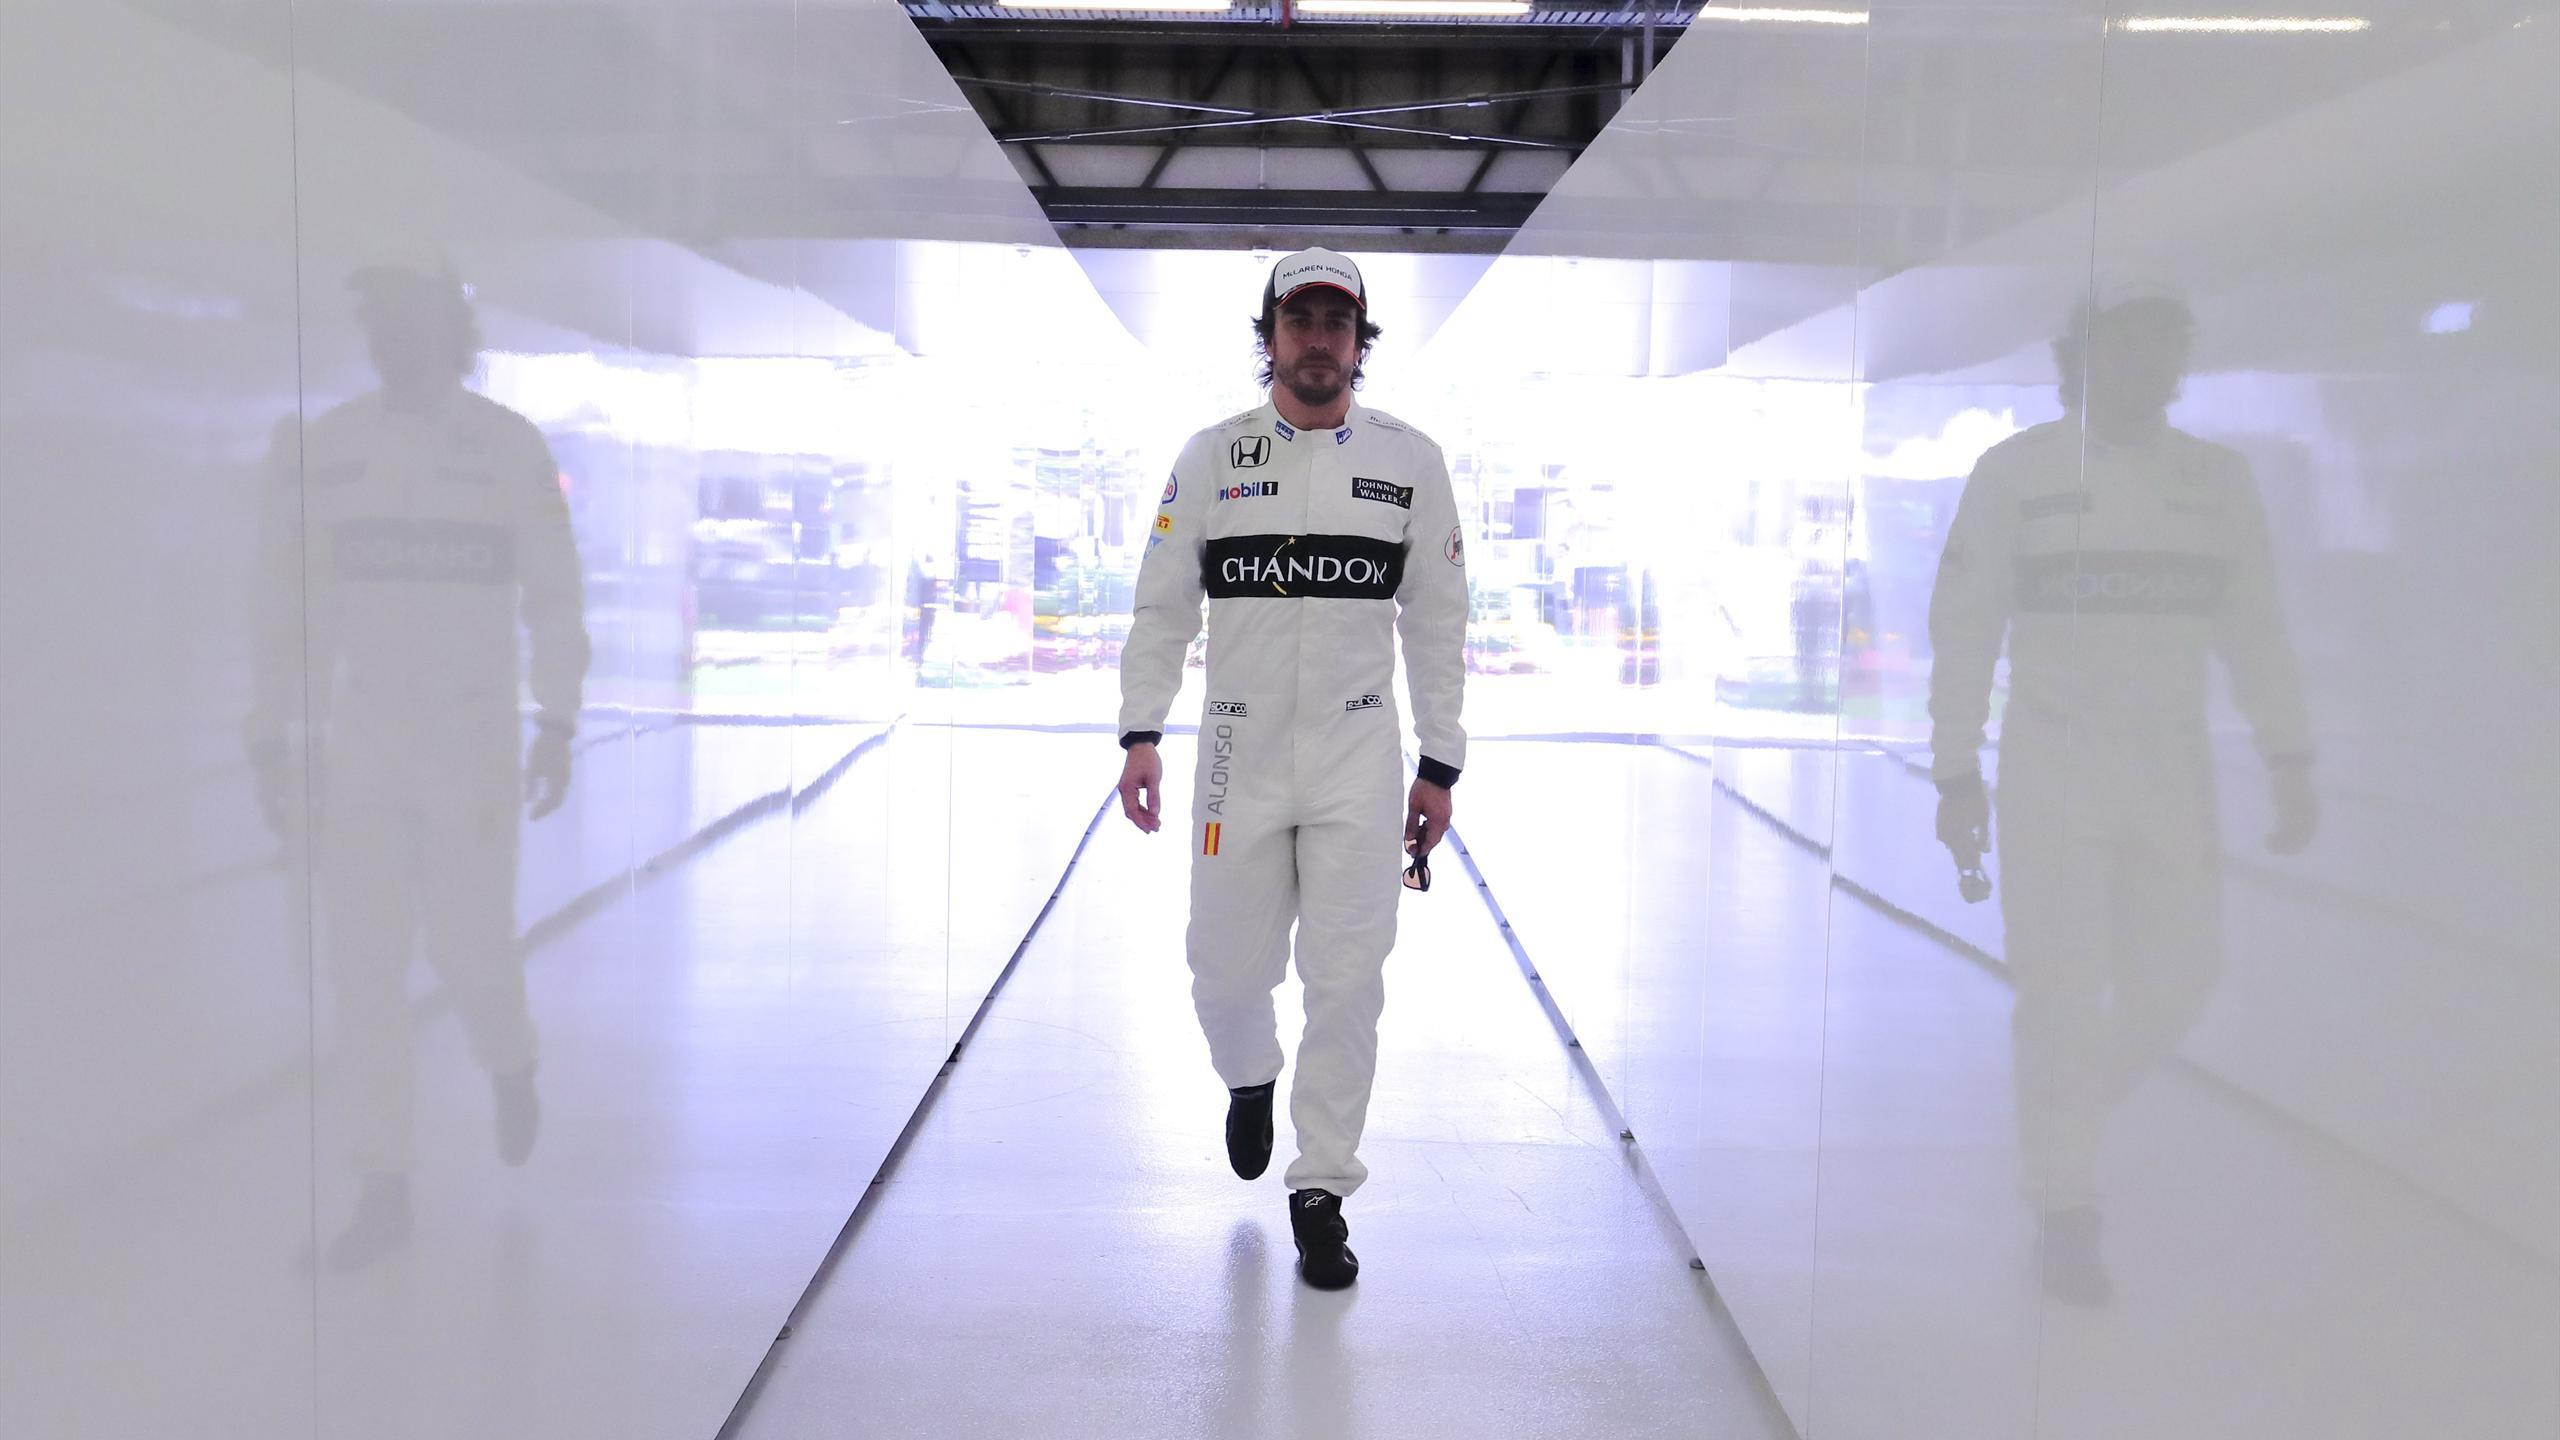 Fernando Alonso (McLaren) au Grand Prix d'Australie 2016